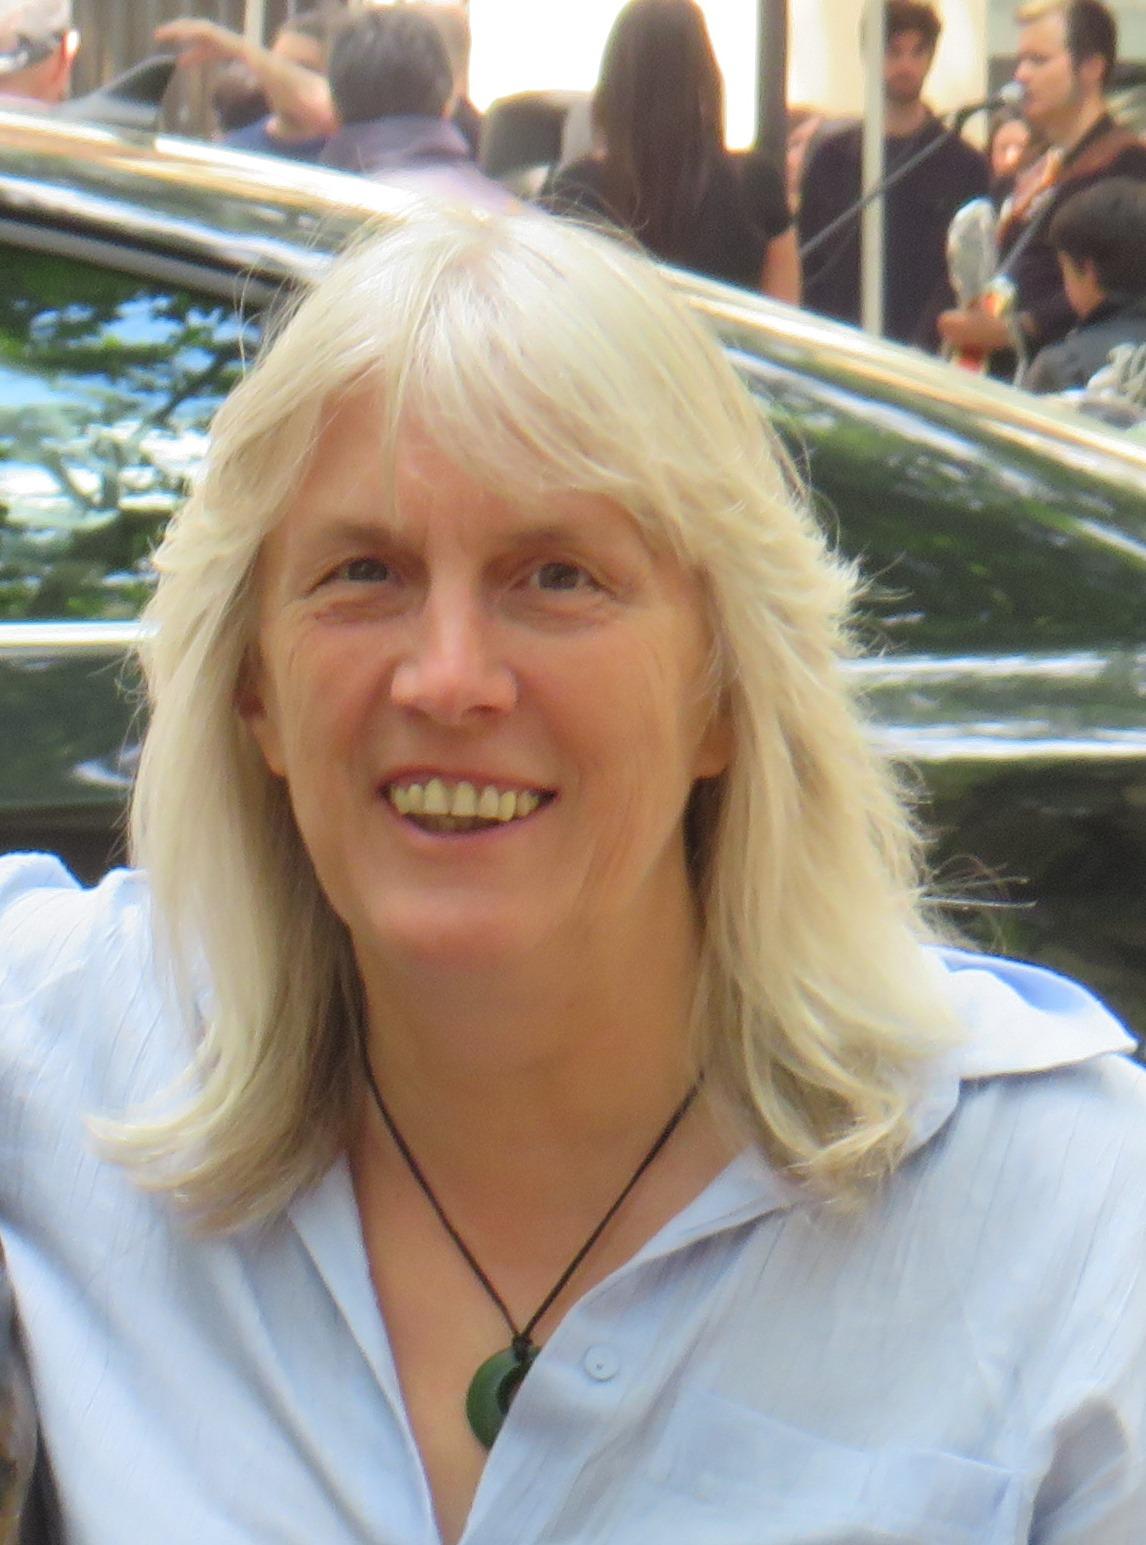 Claire Freeman, Professor in Geography at the University of Otago, Dunedin, New Zealand